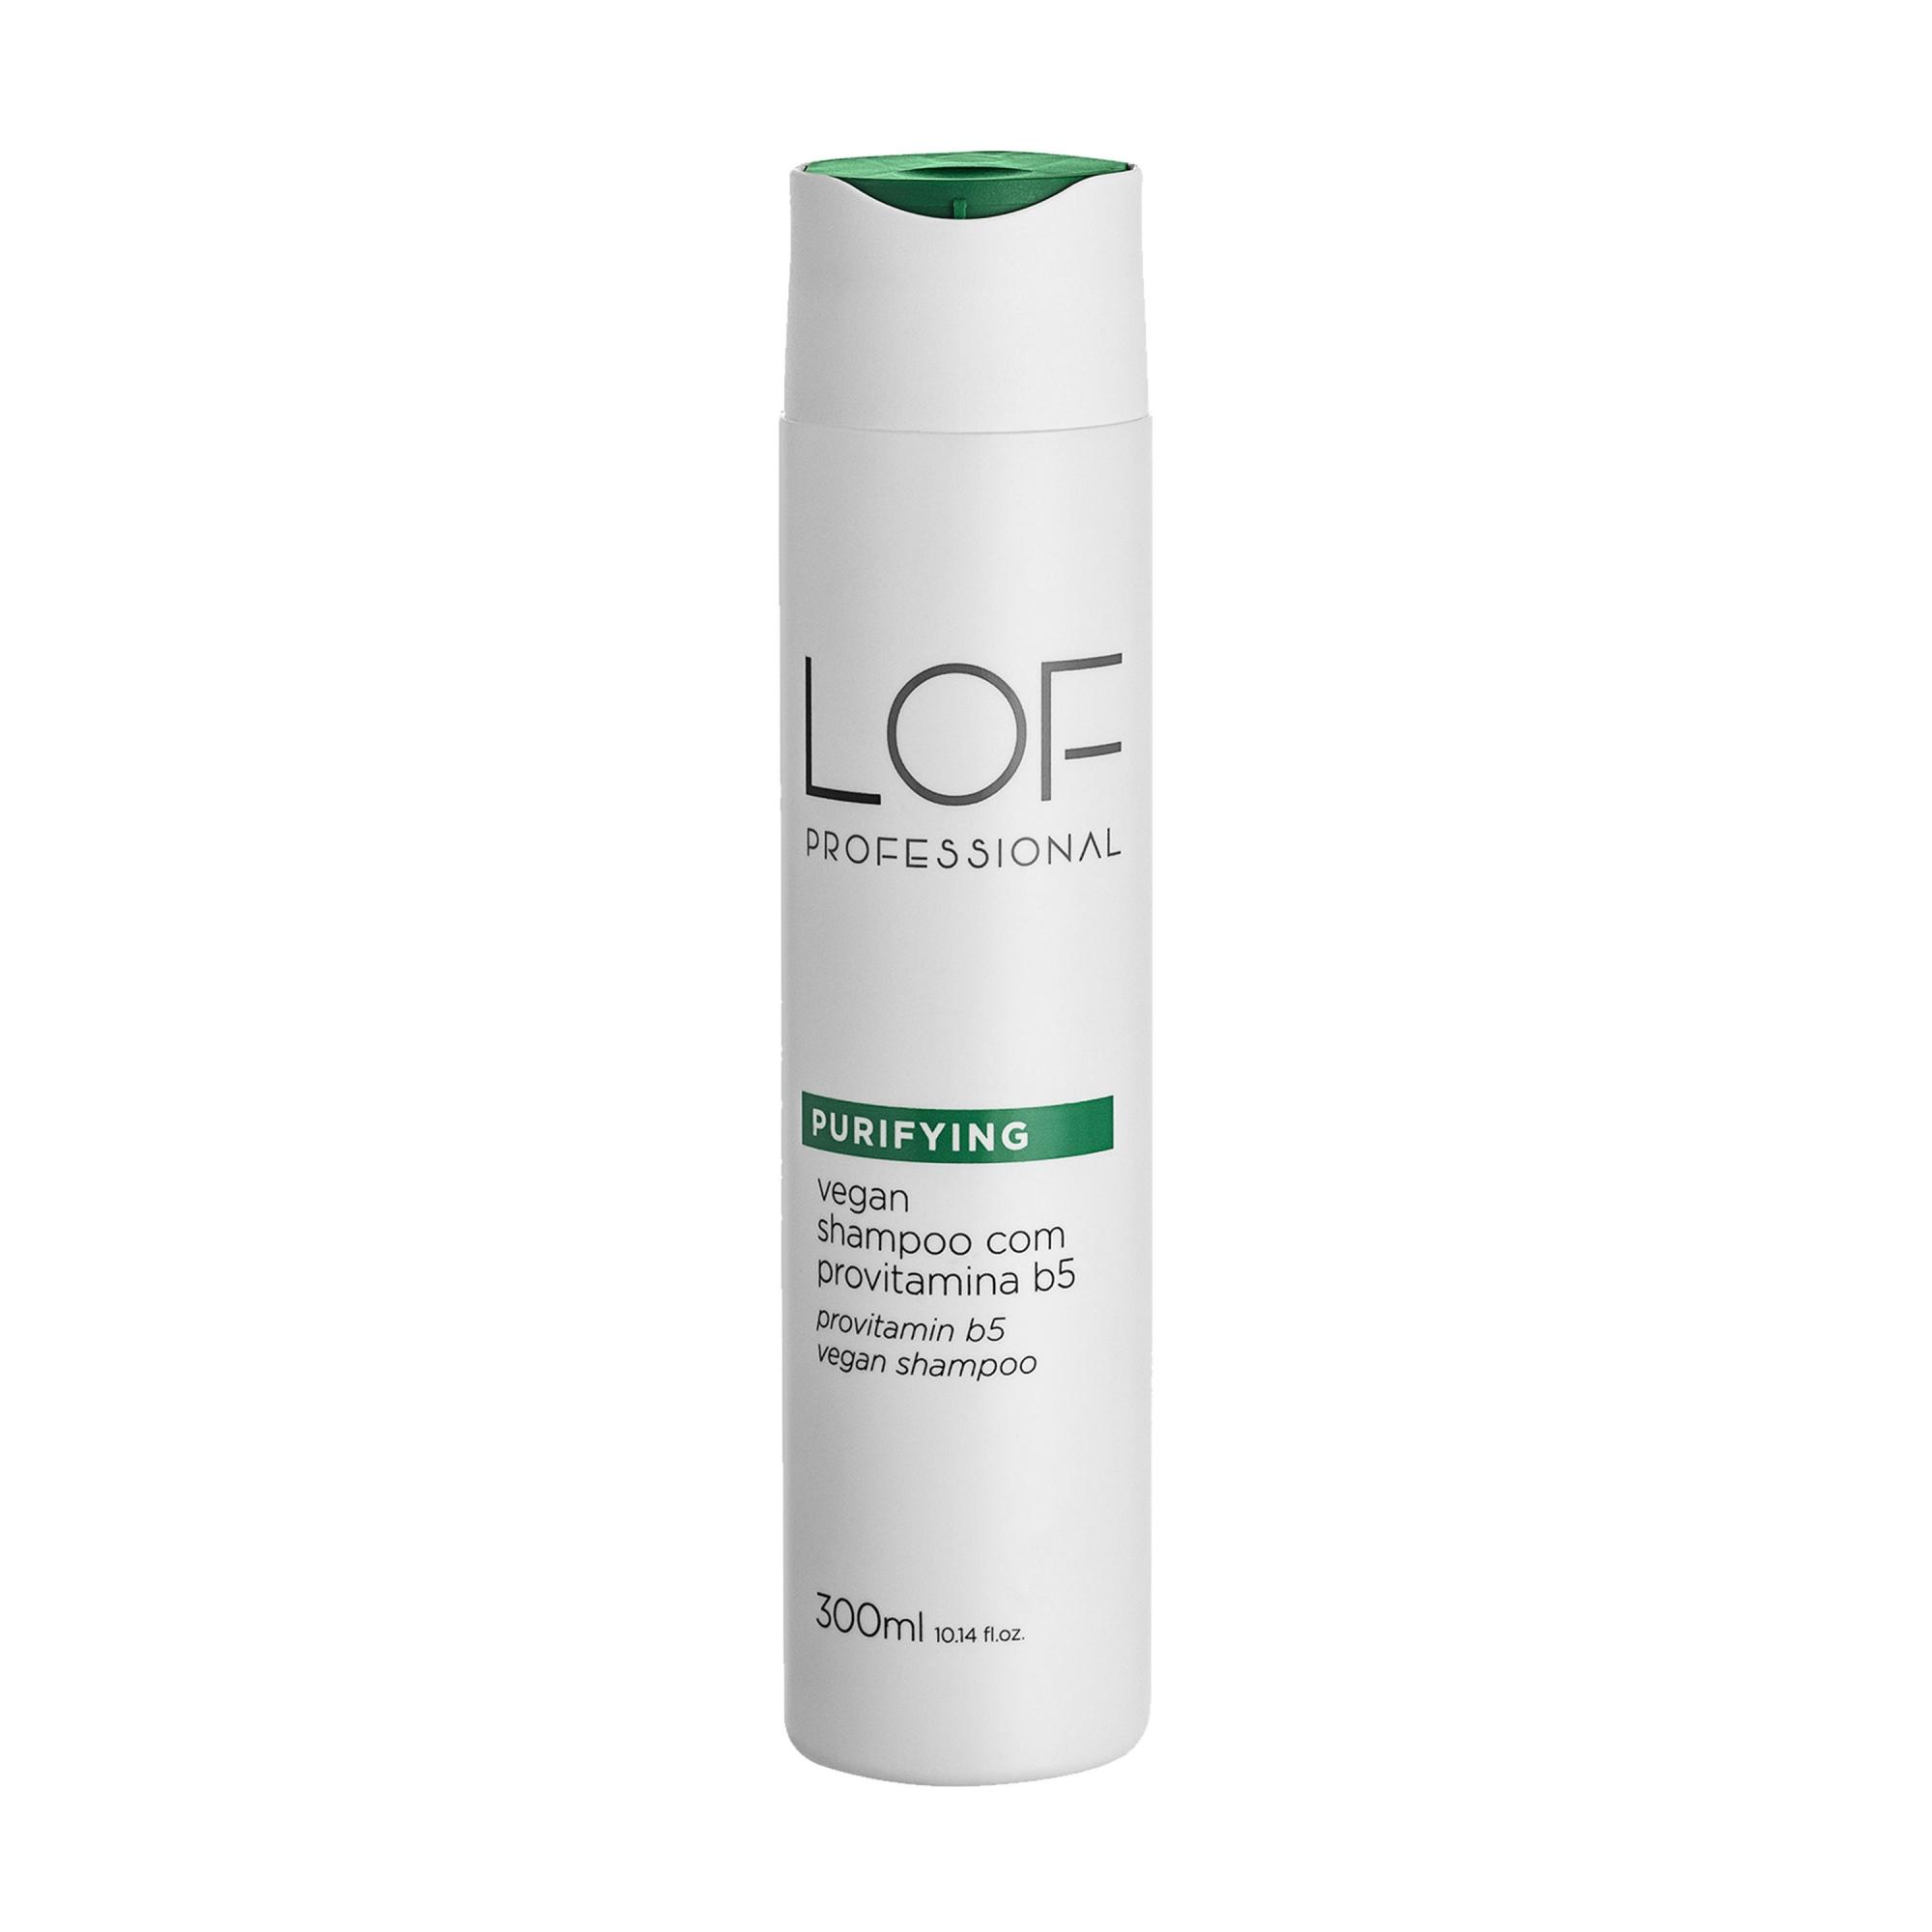 Shampoo Vegano Purifying Vegan 300mL